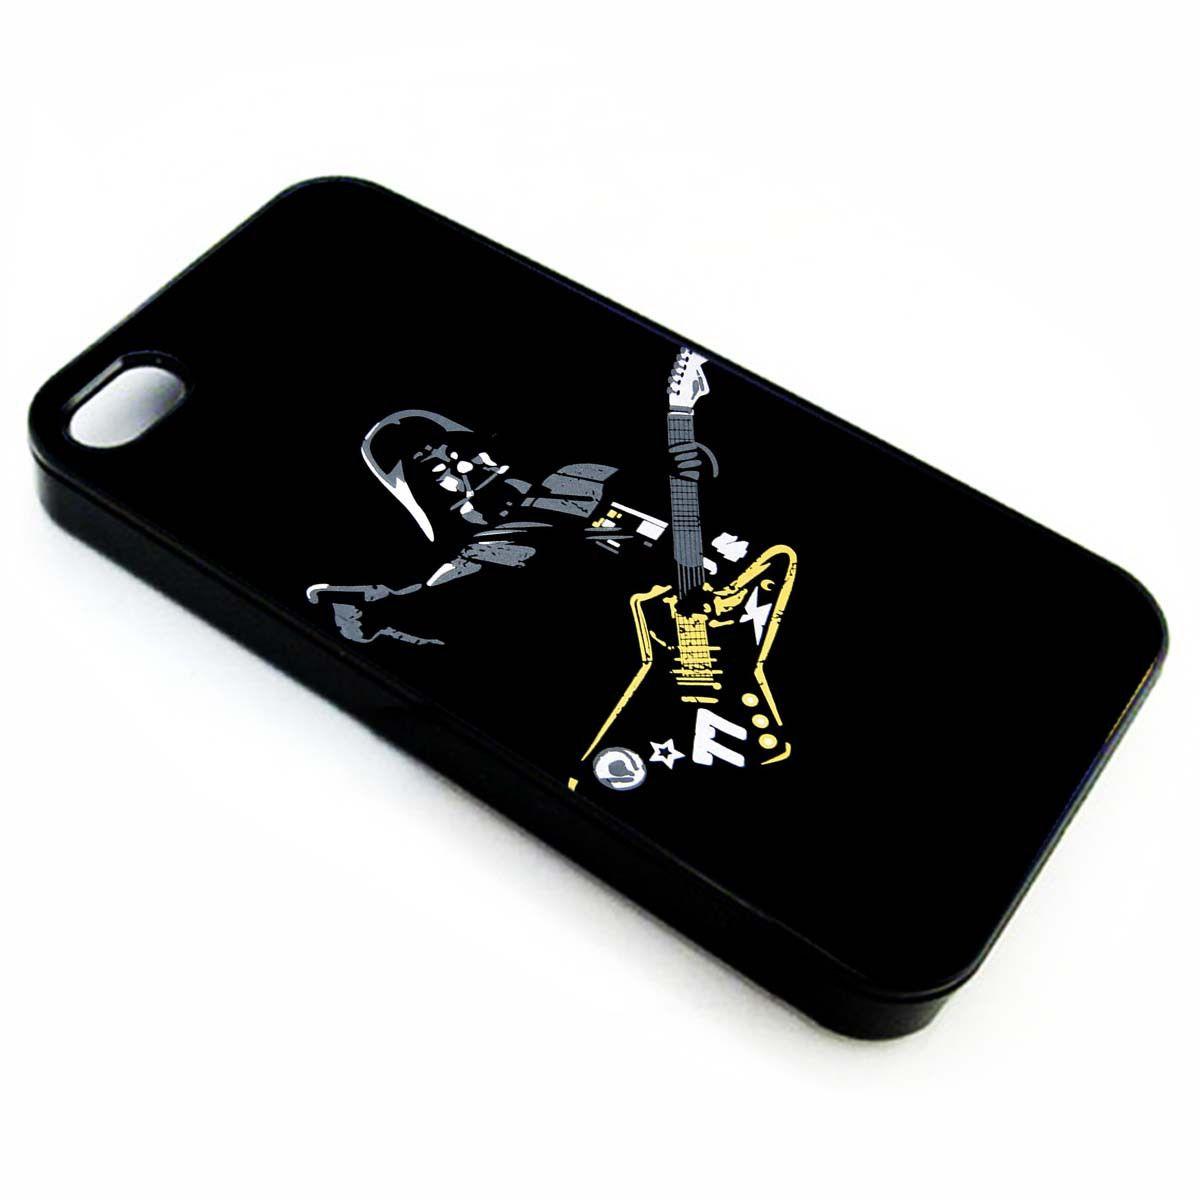 Darth Vader Rock | iPhone 4/4s 5 5s 5c 6 6+ Case | Samsung Galaxy s3 s4 s5 s6 Case | - JEFFRPOPE